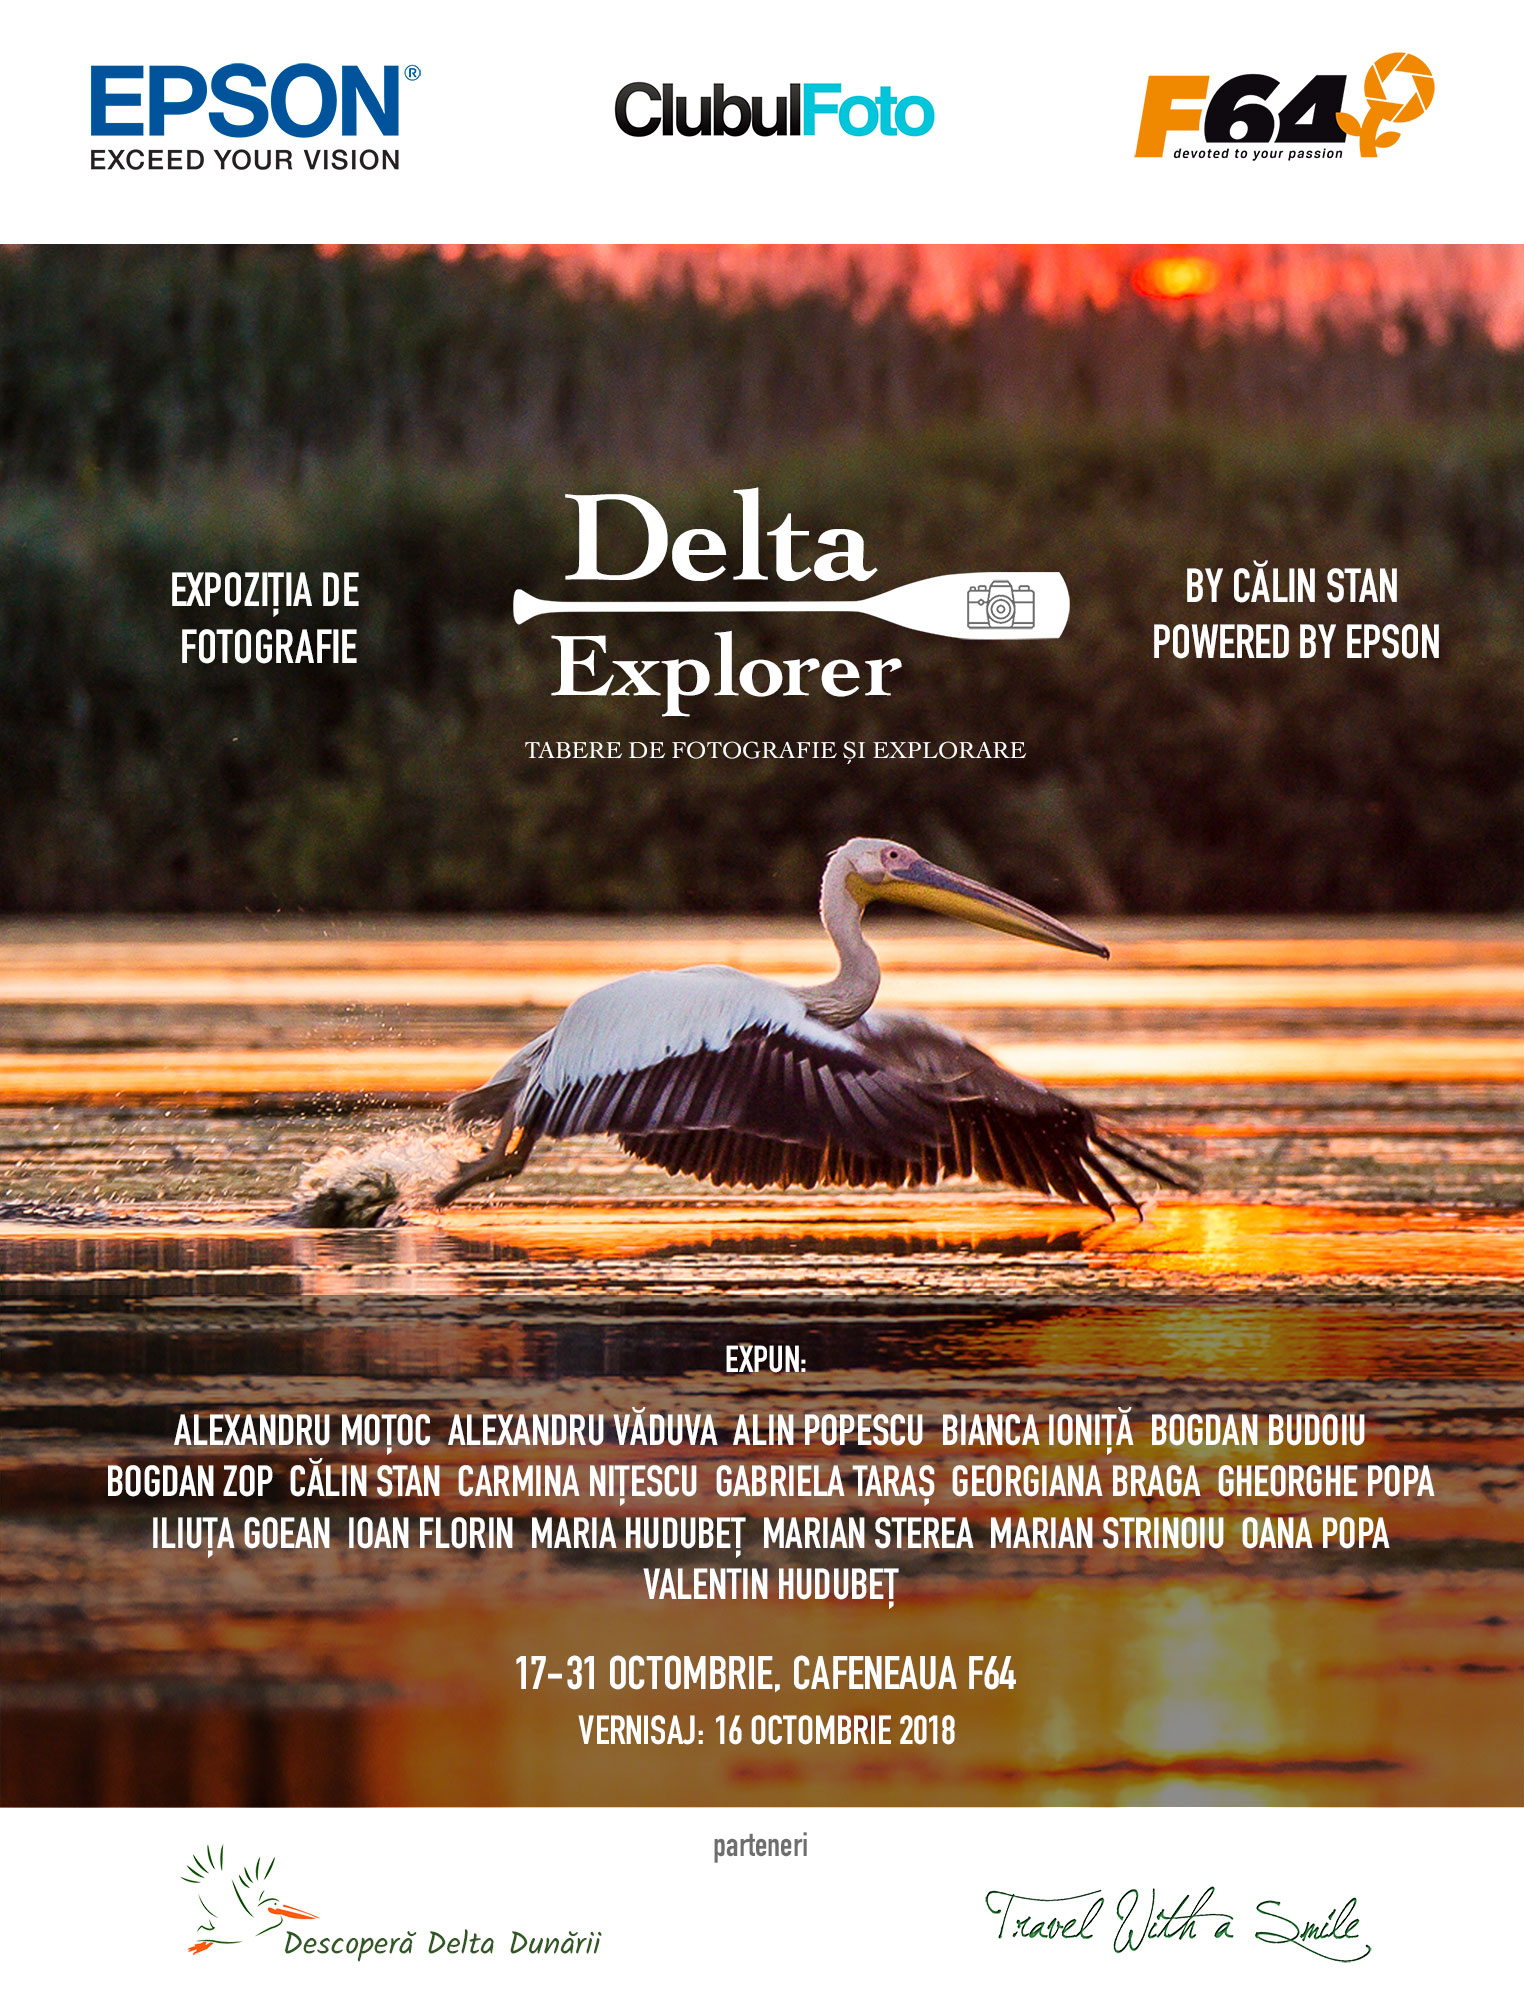 Vernisajul expozitiei foto Delta Explorer are loc pe 16 Octombrie, incepand cu ora 19, in sala de expozitii F64